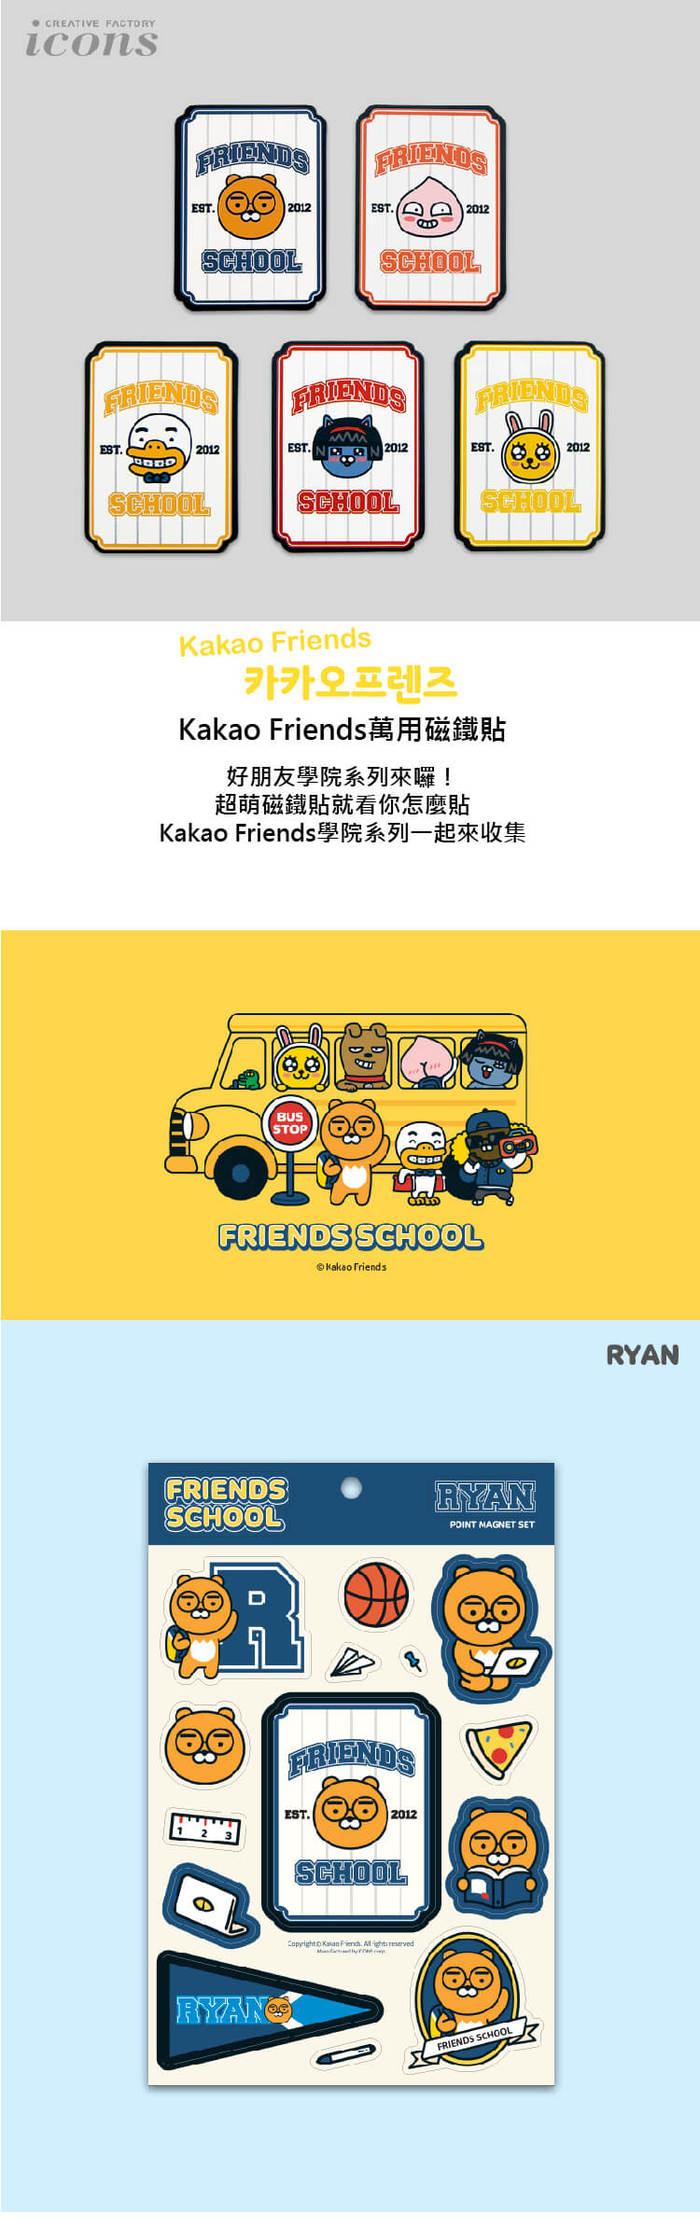 Kakao Friends|好朋友學院 萬用磁鐵貼 APEACH